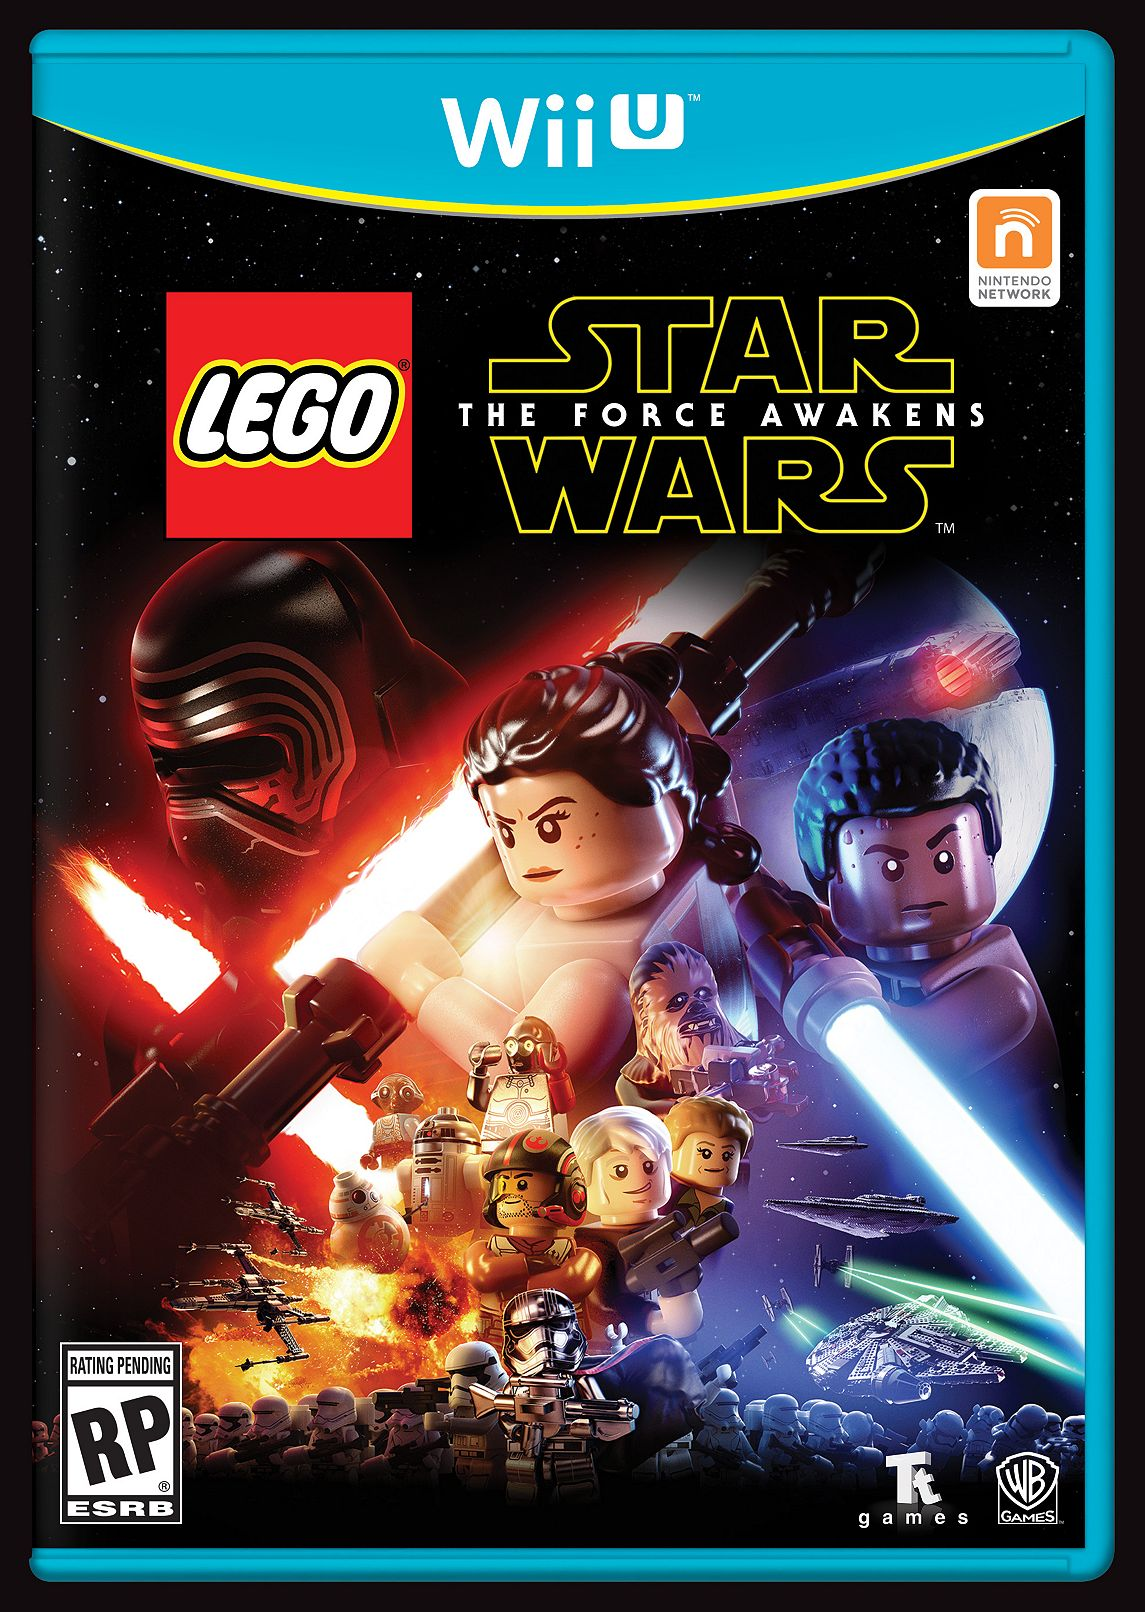 LEGO® Star Wars™: The Force Awakens Wii U™ Video Game